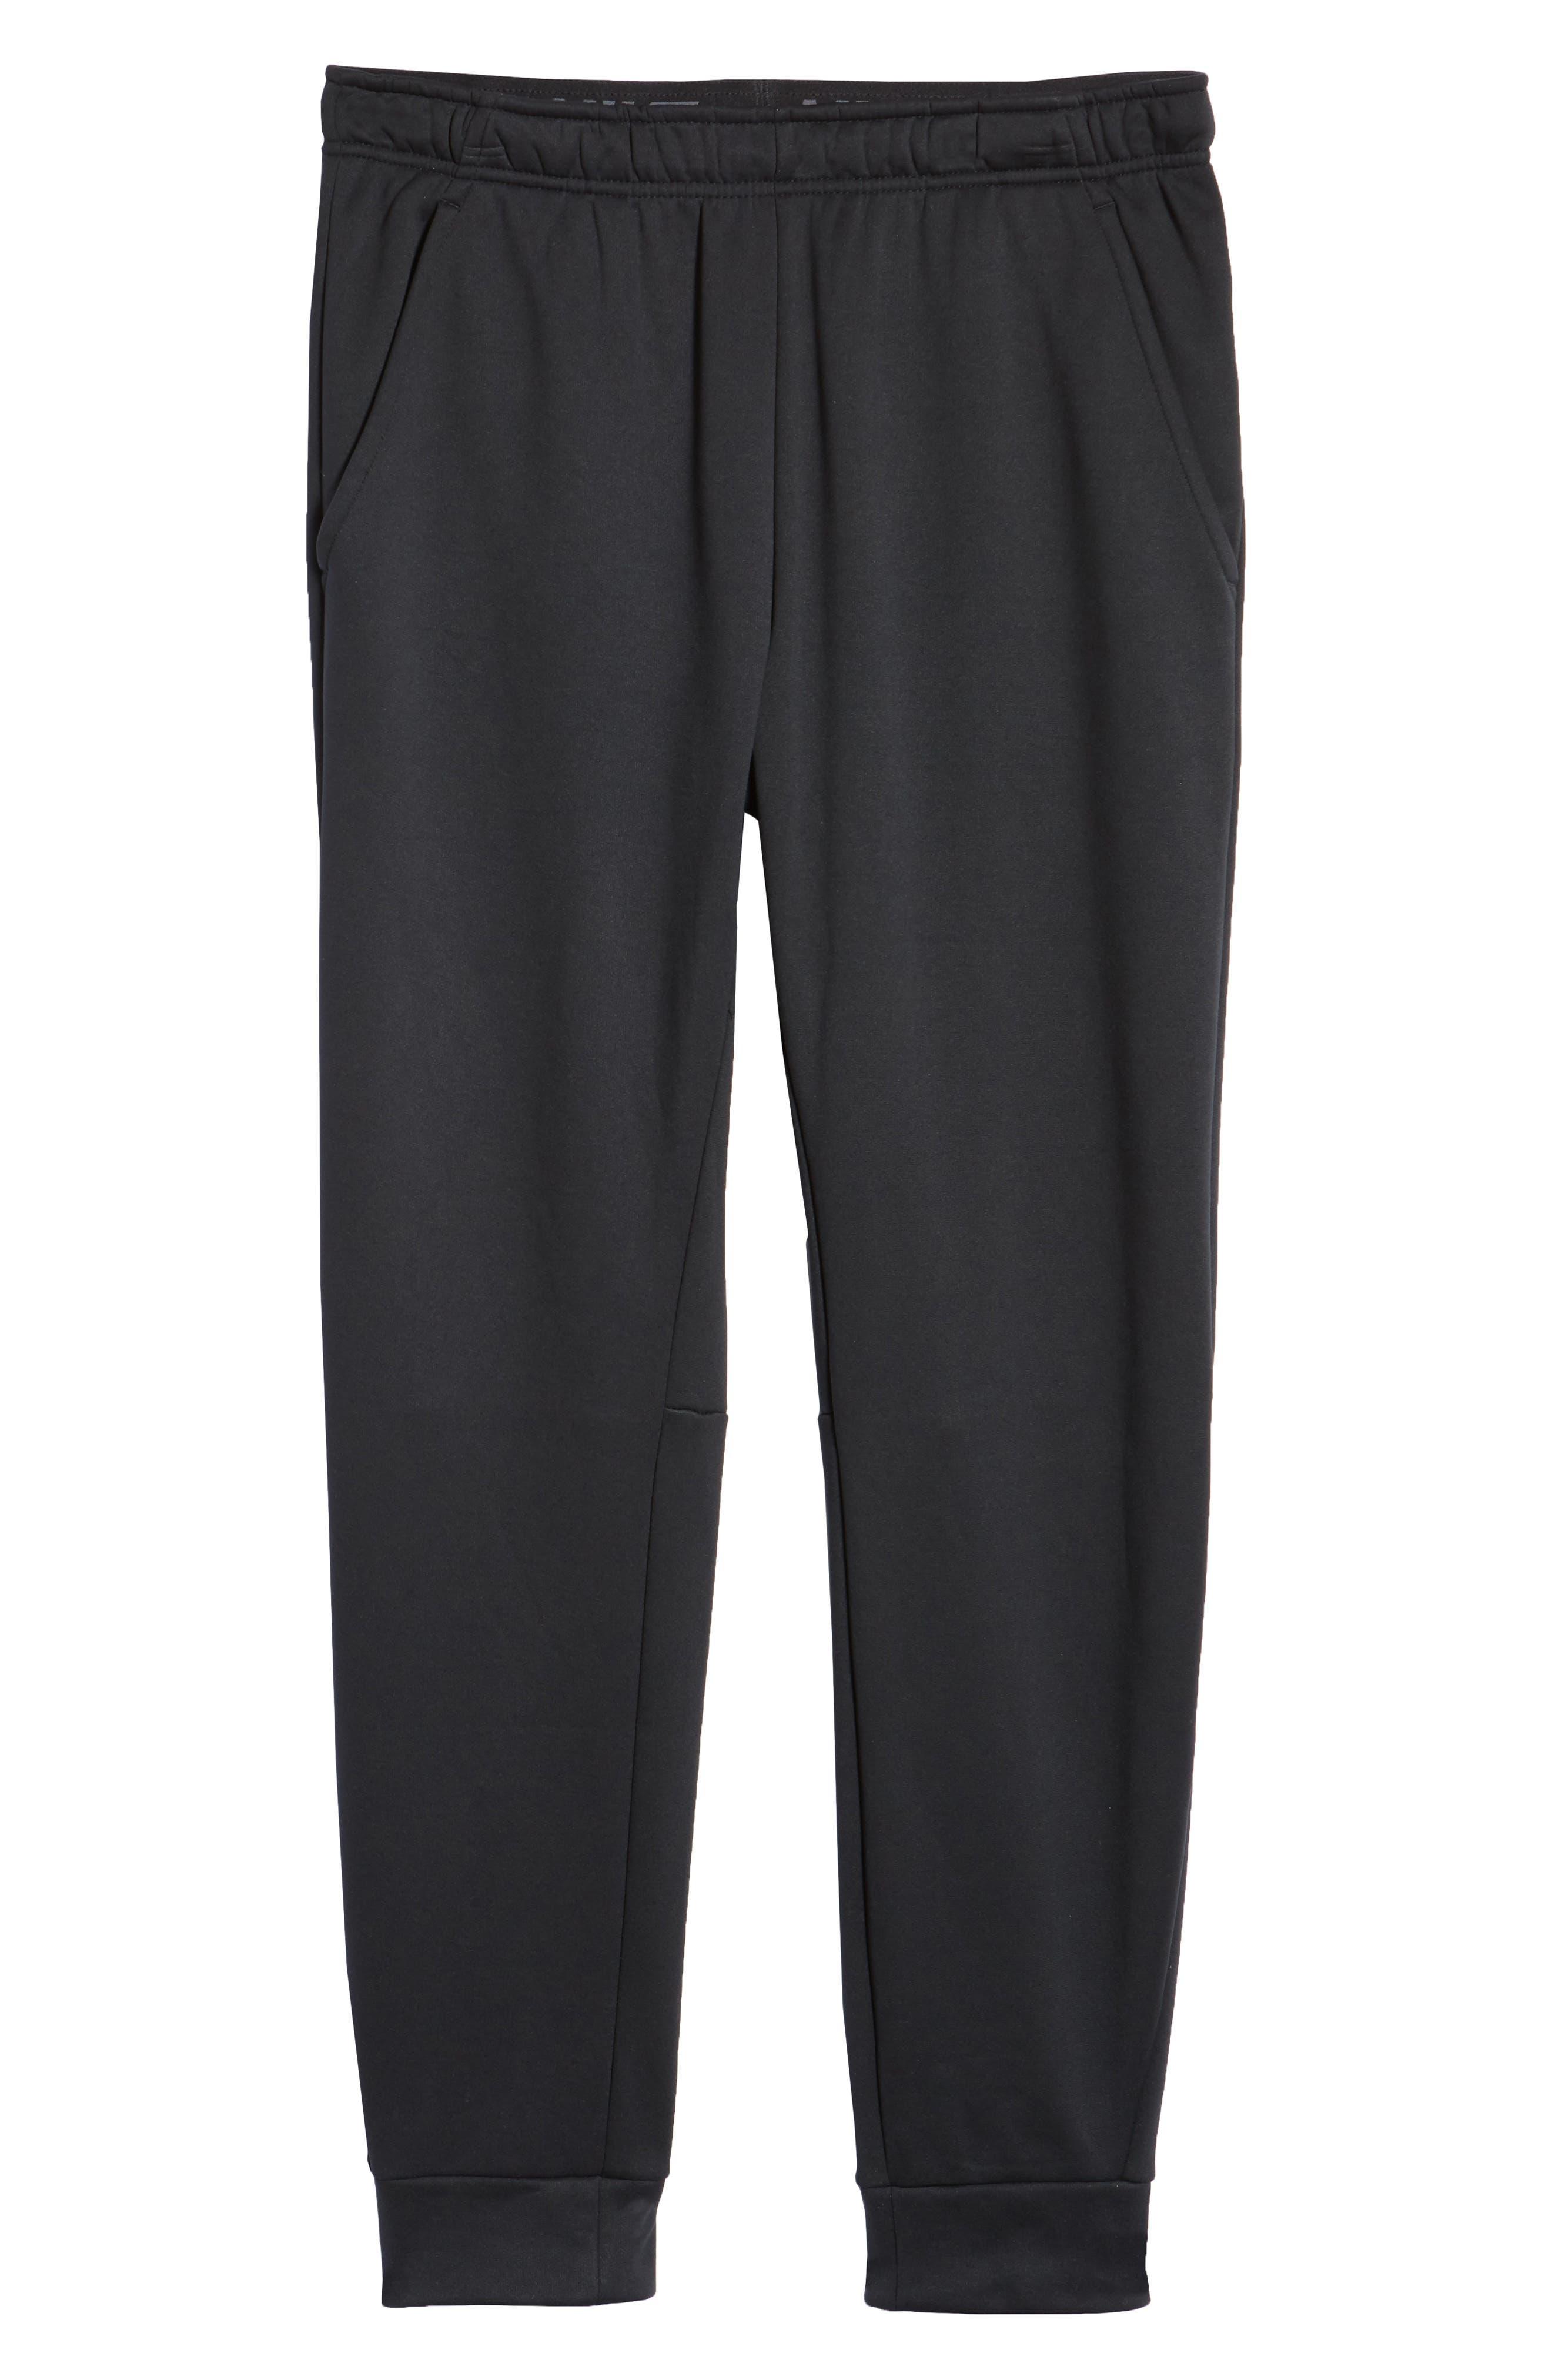 Therma Tapered Pants,                             Alternate thumbnail 6, color,                             BLACK/ WHITE